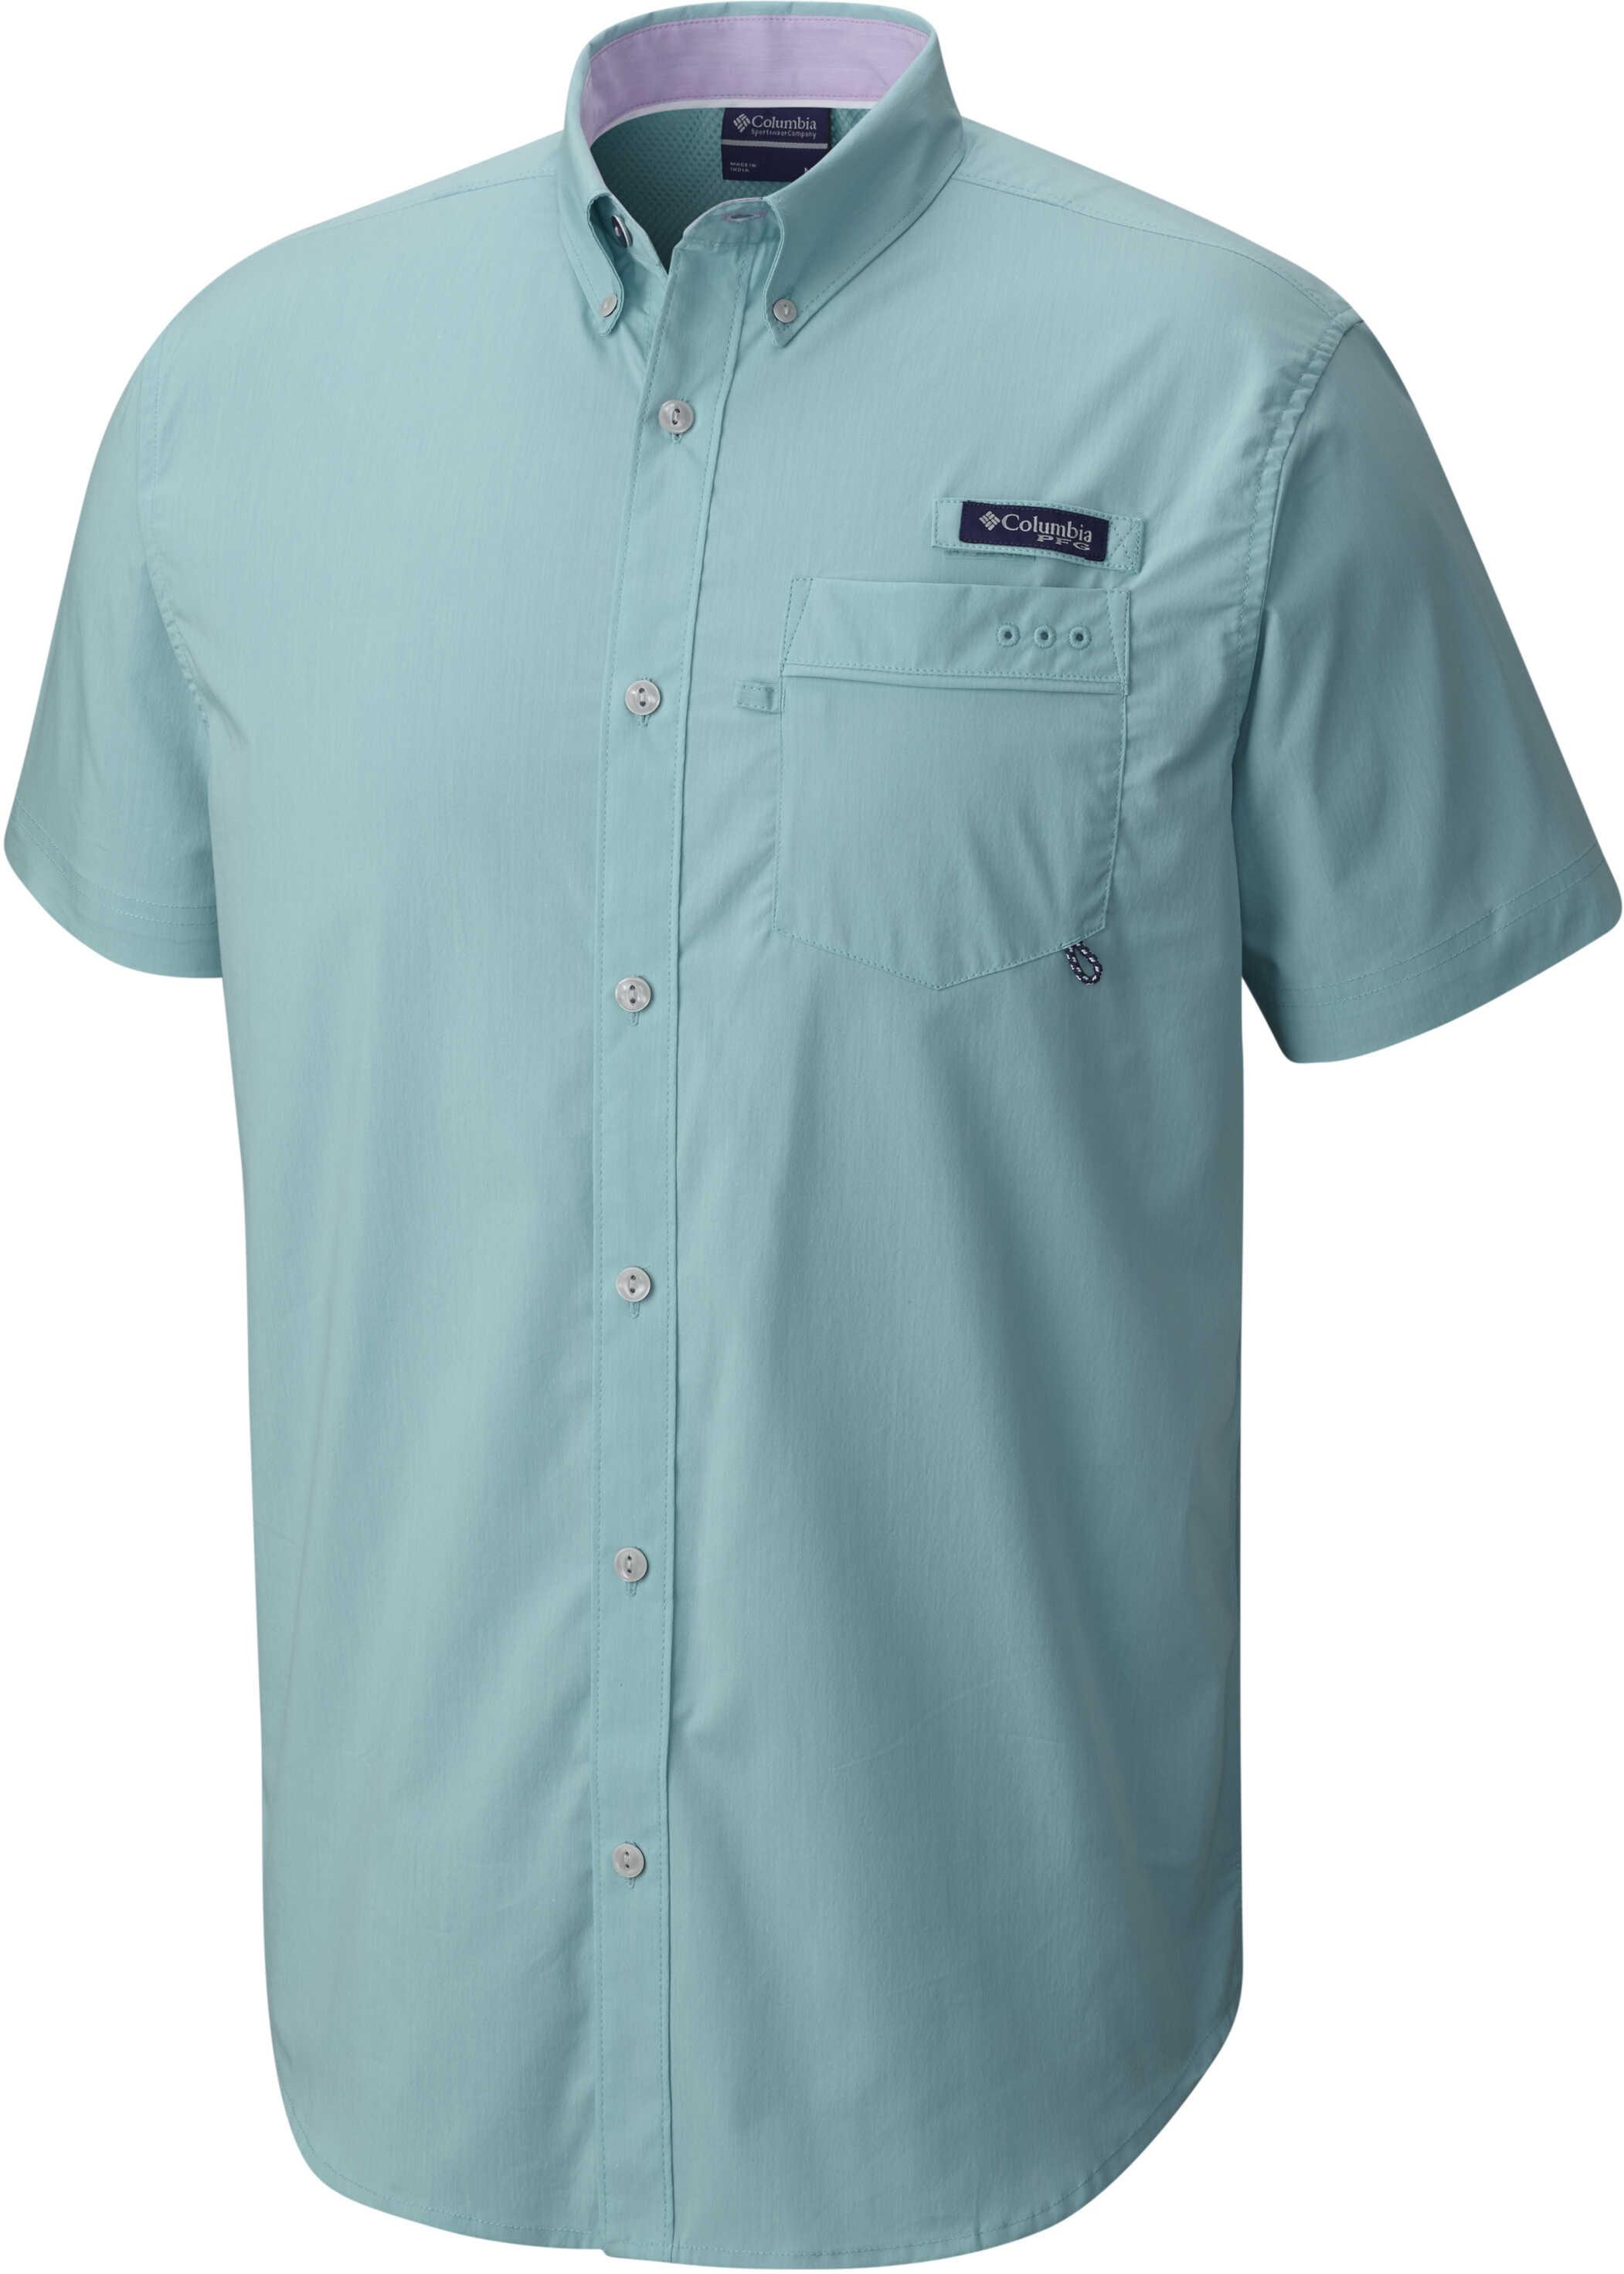 Columbia PFG HARBORSIDE™ WOVEN SHORT SLEEVE SHIRT-Bright Peach, Vivid Blue Moxie, Hydrangea